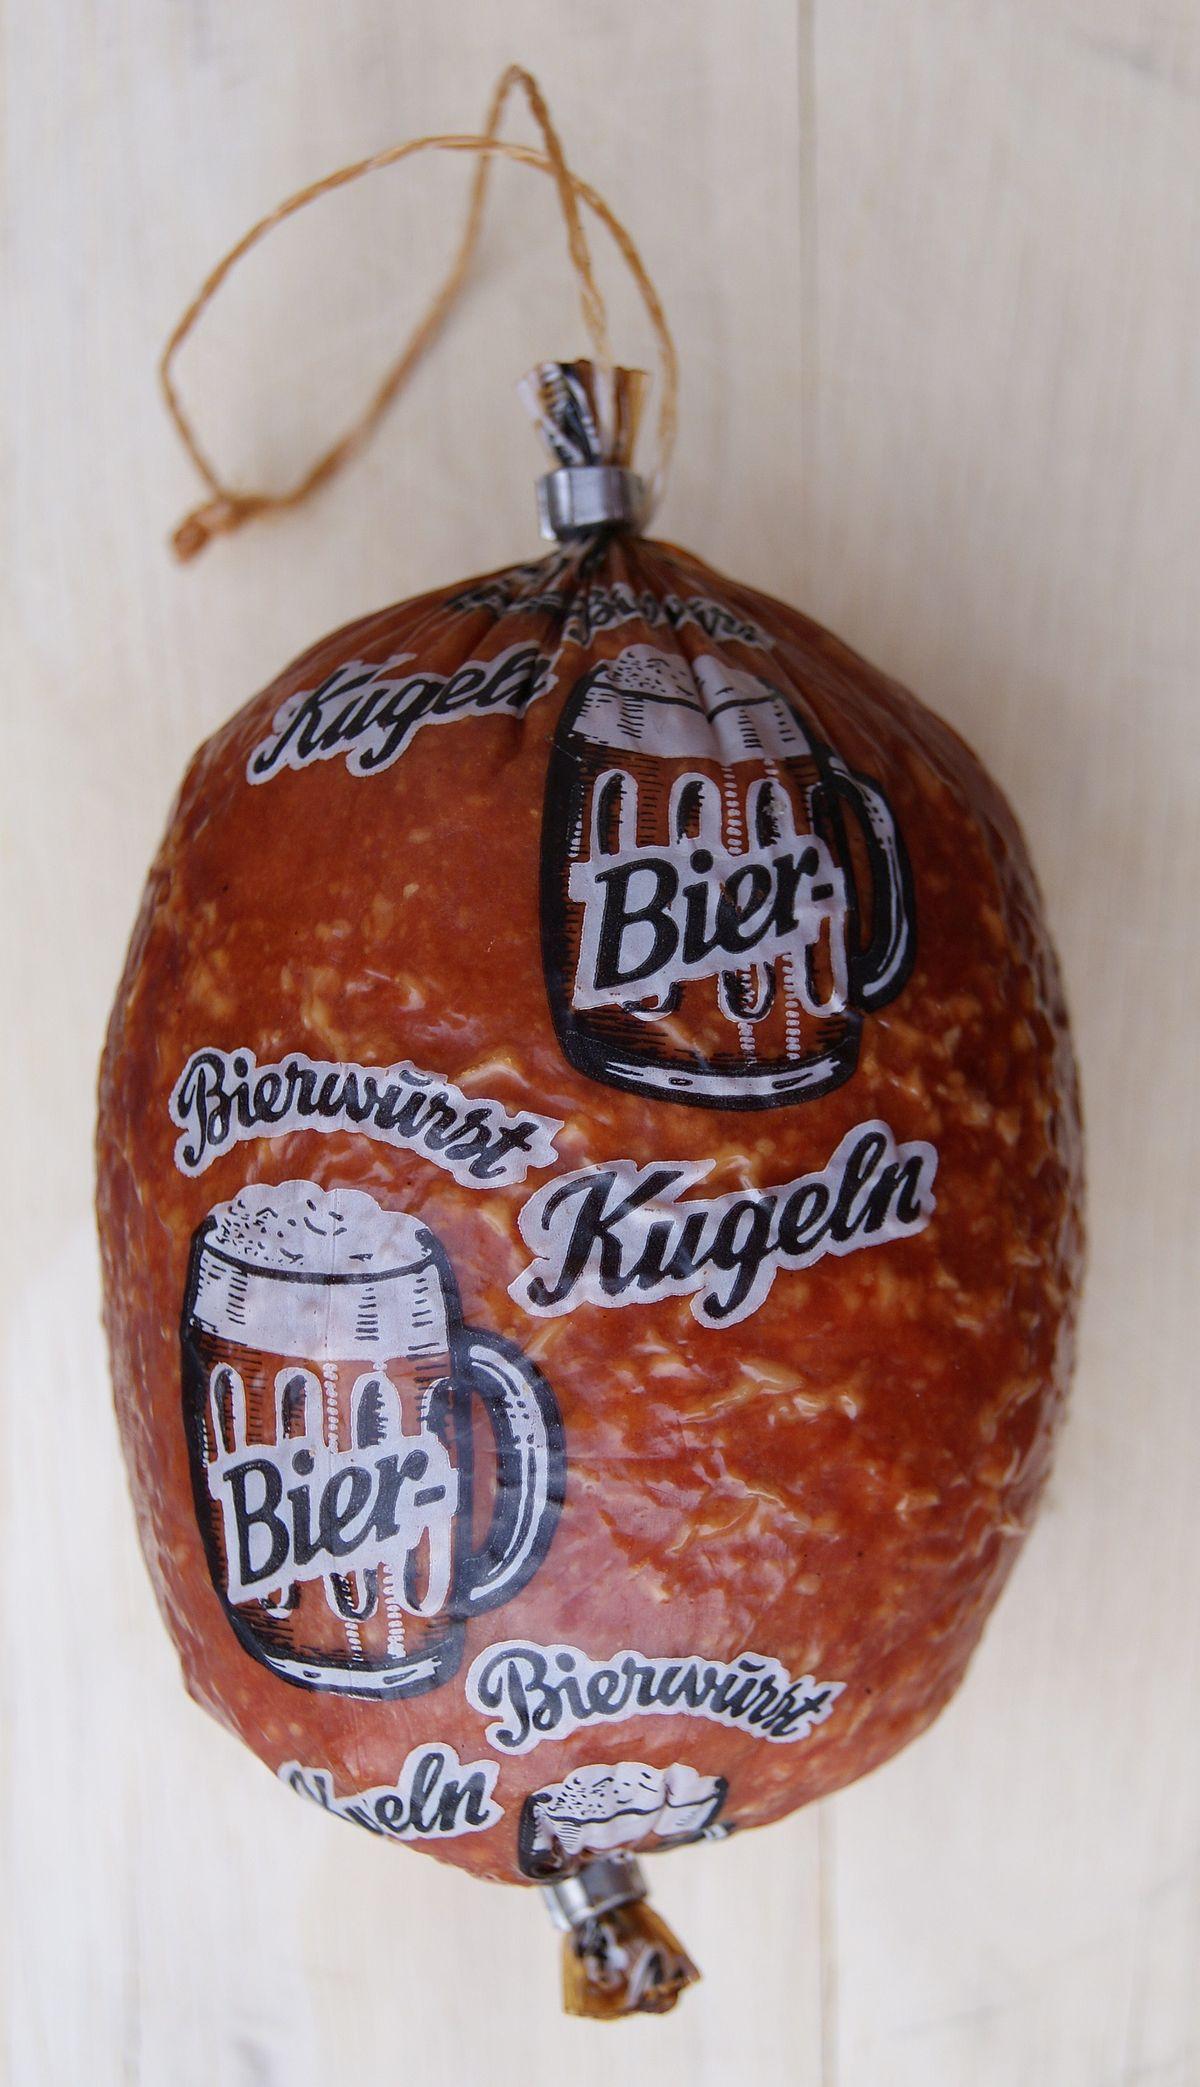 Bierwurst Wikipedia